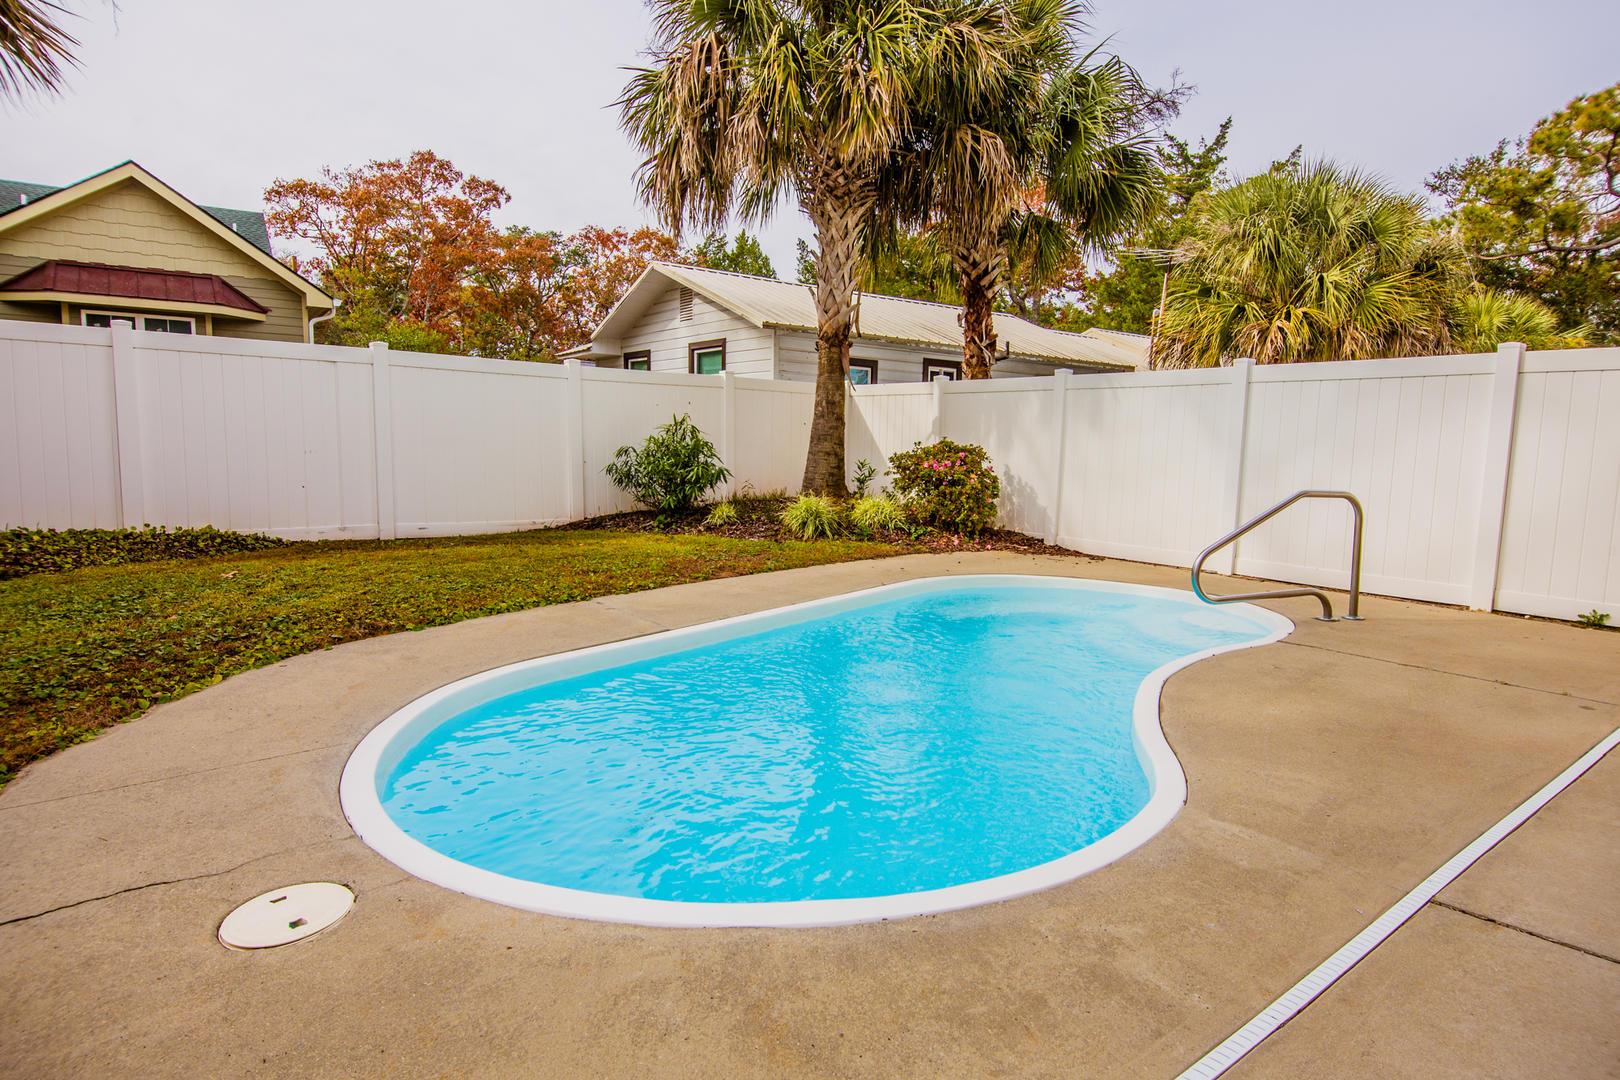 Ocean Breeze Cottage - Private Outdoor Pool in Backyard